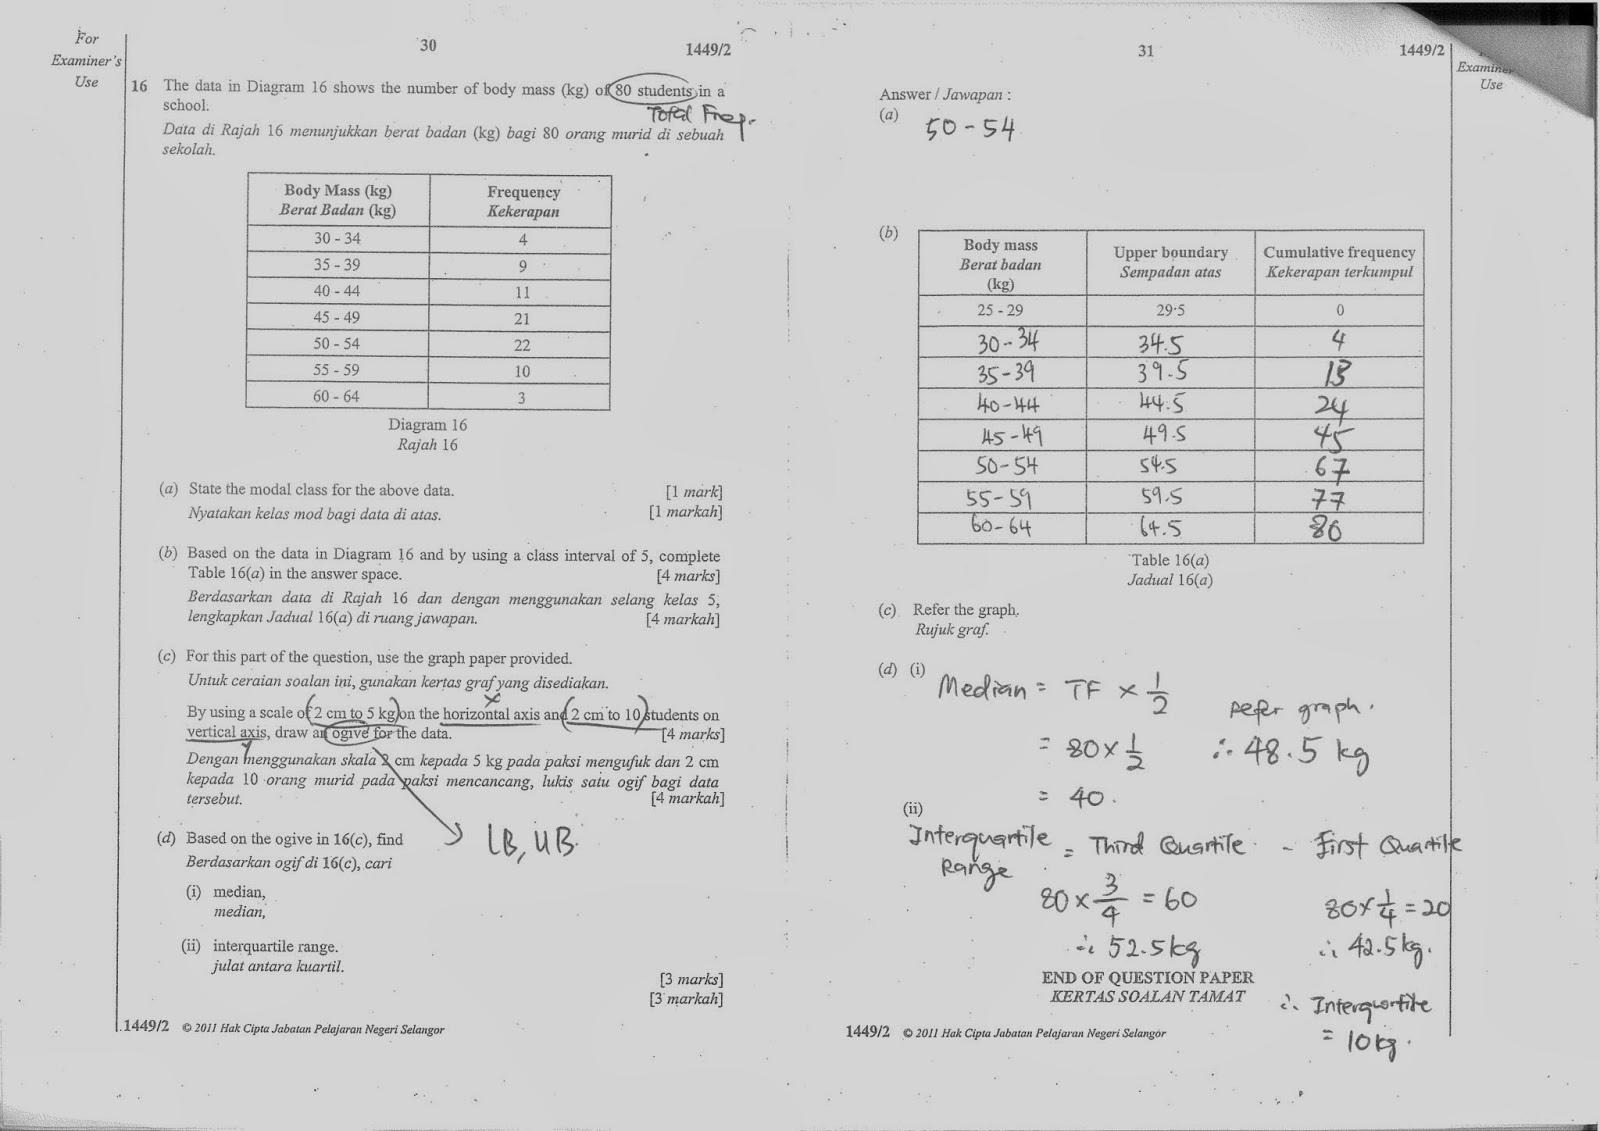 TTC MATHS DEPARTMENT: Form 4 Solution on JPS 2011 (OBJ